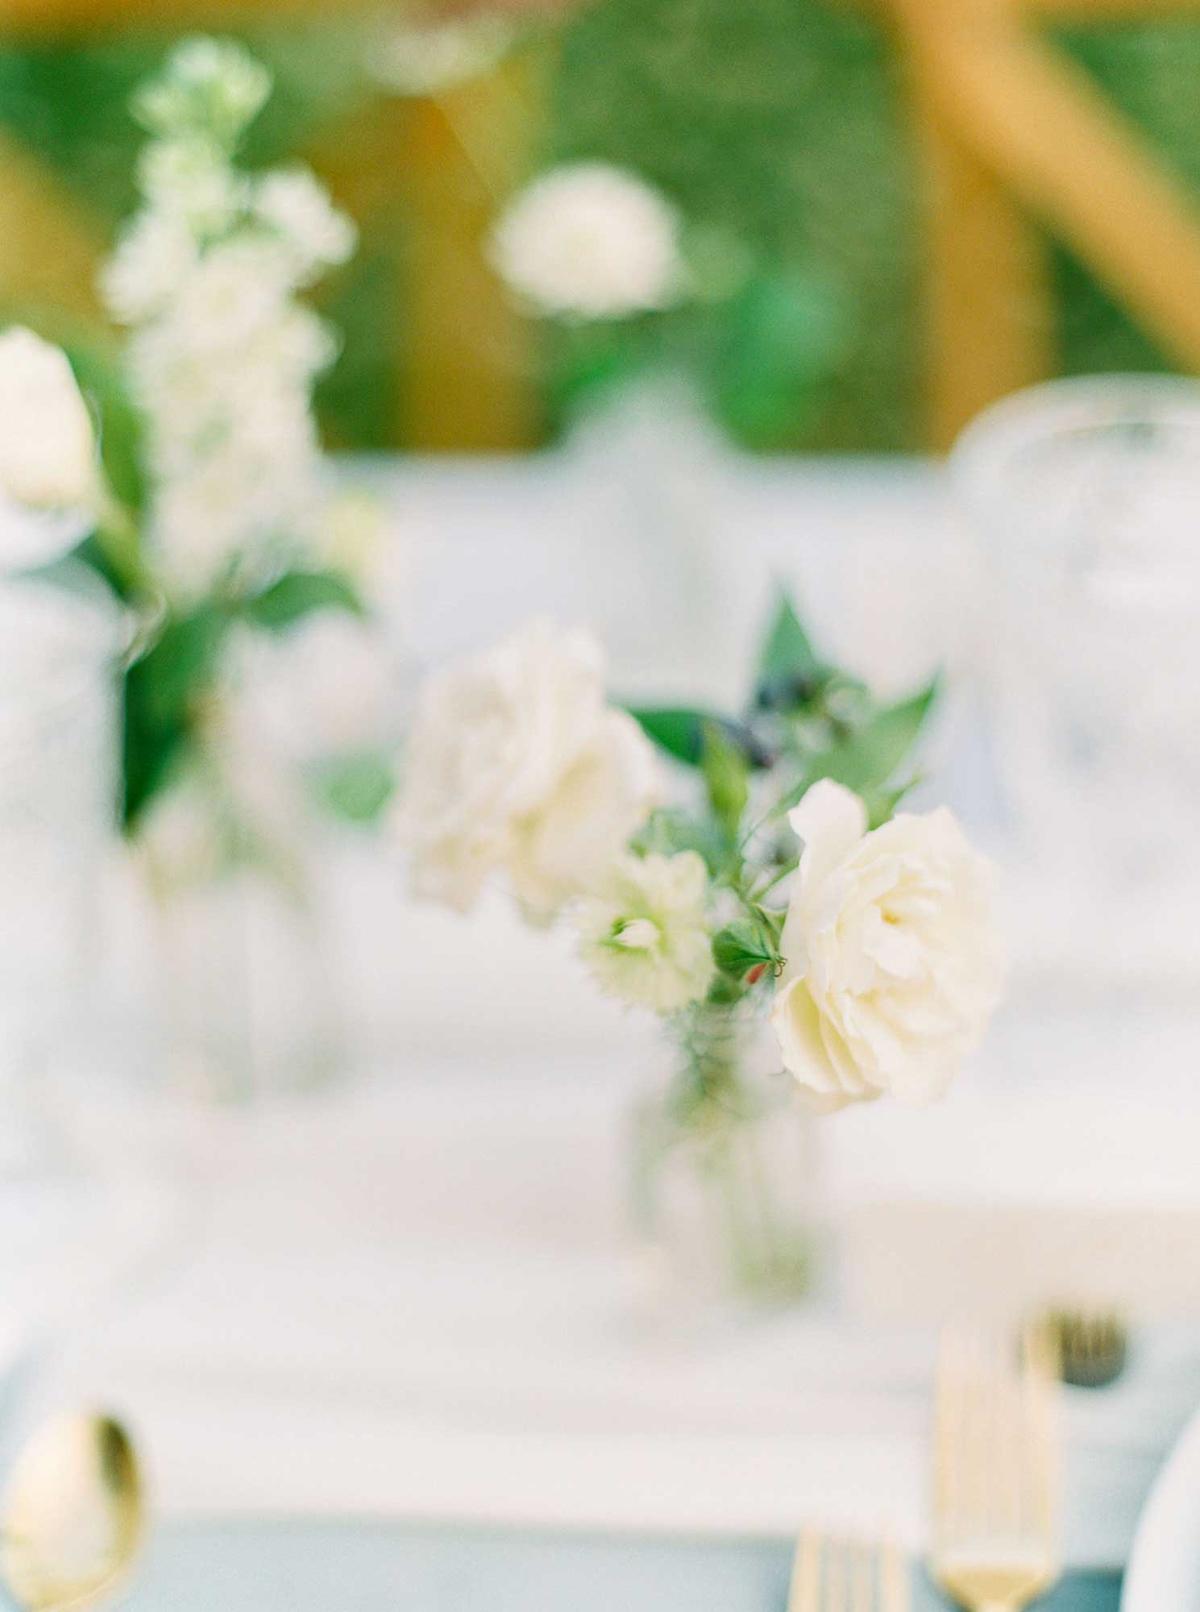 kayla-yestal-vineyard-bride-swish-list-woodland-weddings-niagara-wedding-editorial-62.jpg